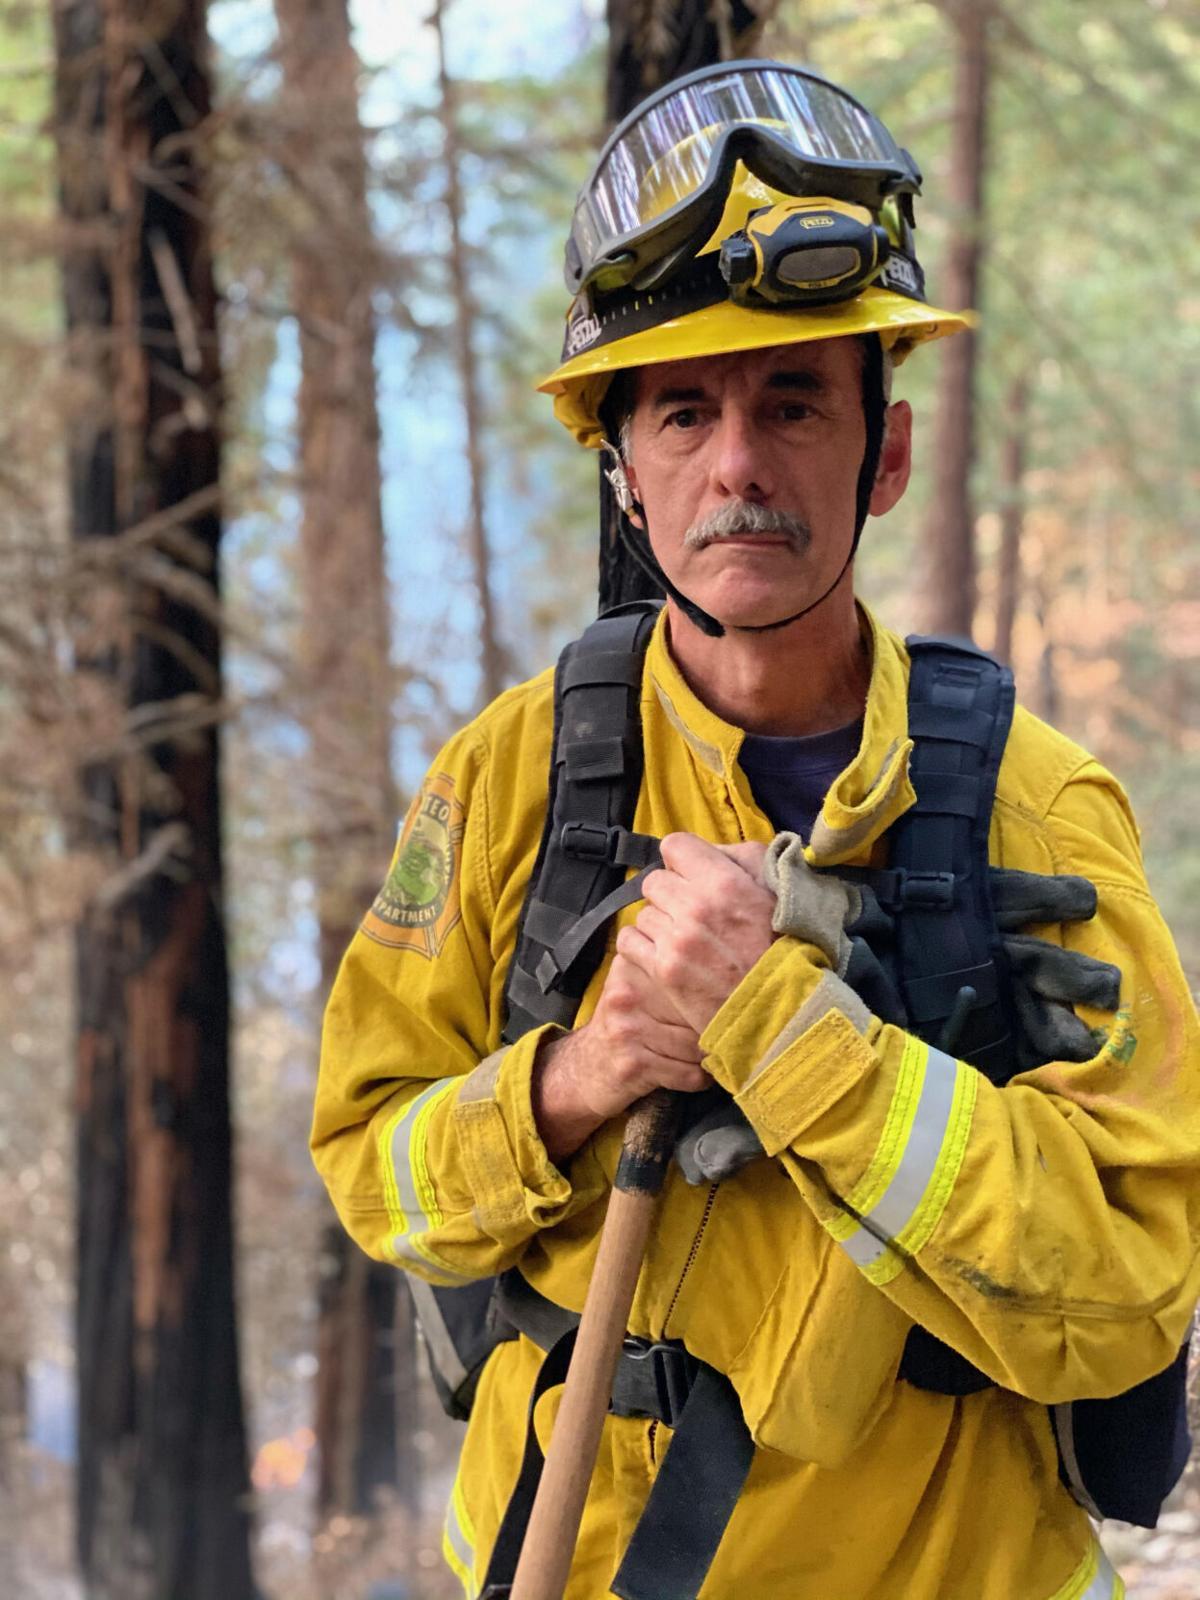 Kings Mountain Volunteer Firefighter